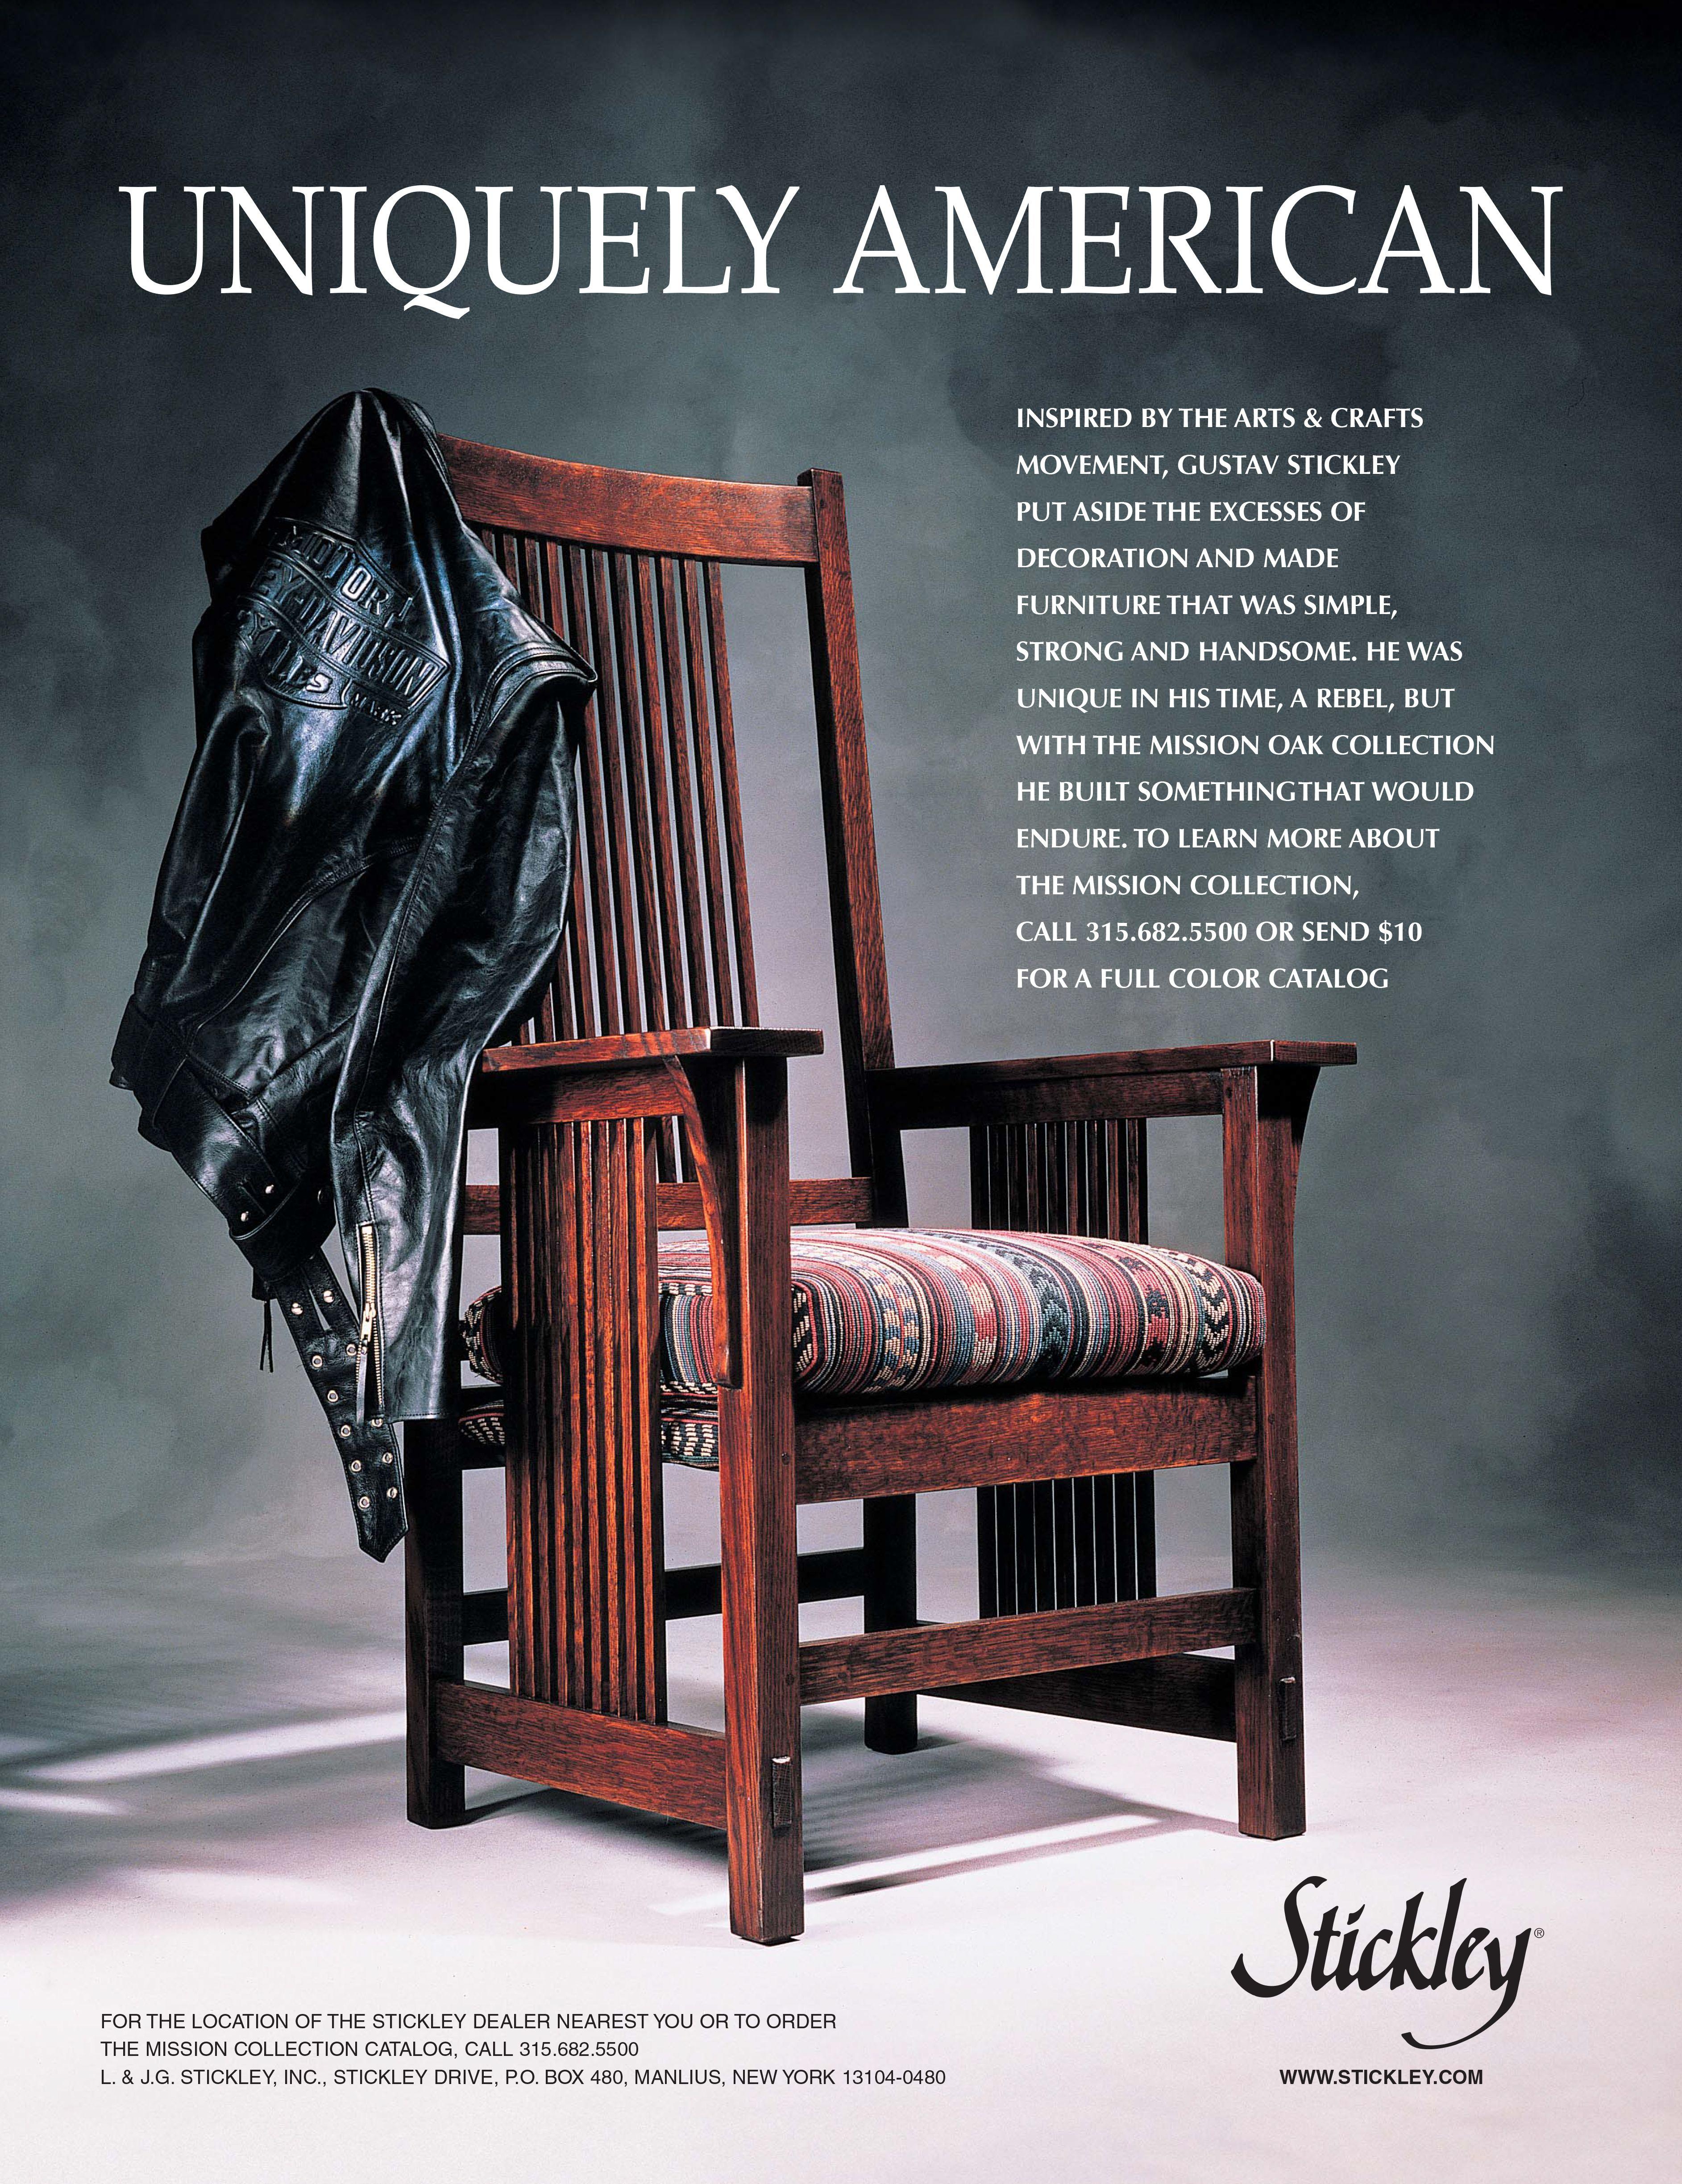 ... Vintage Stickley Furniture Advertisement Uniquely American Harley Jacket